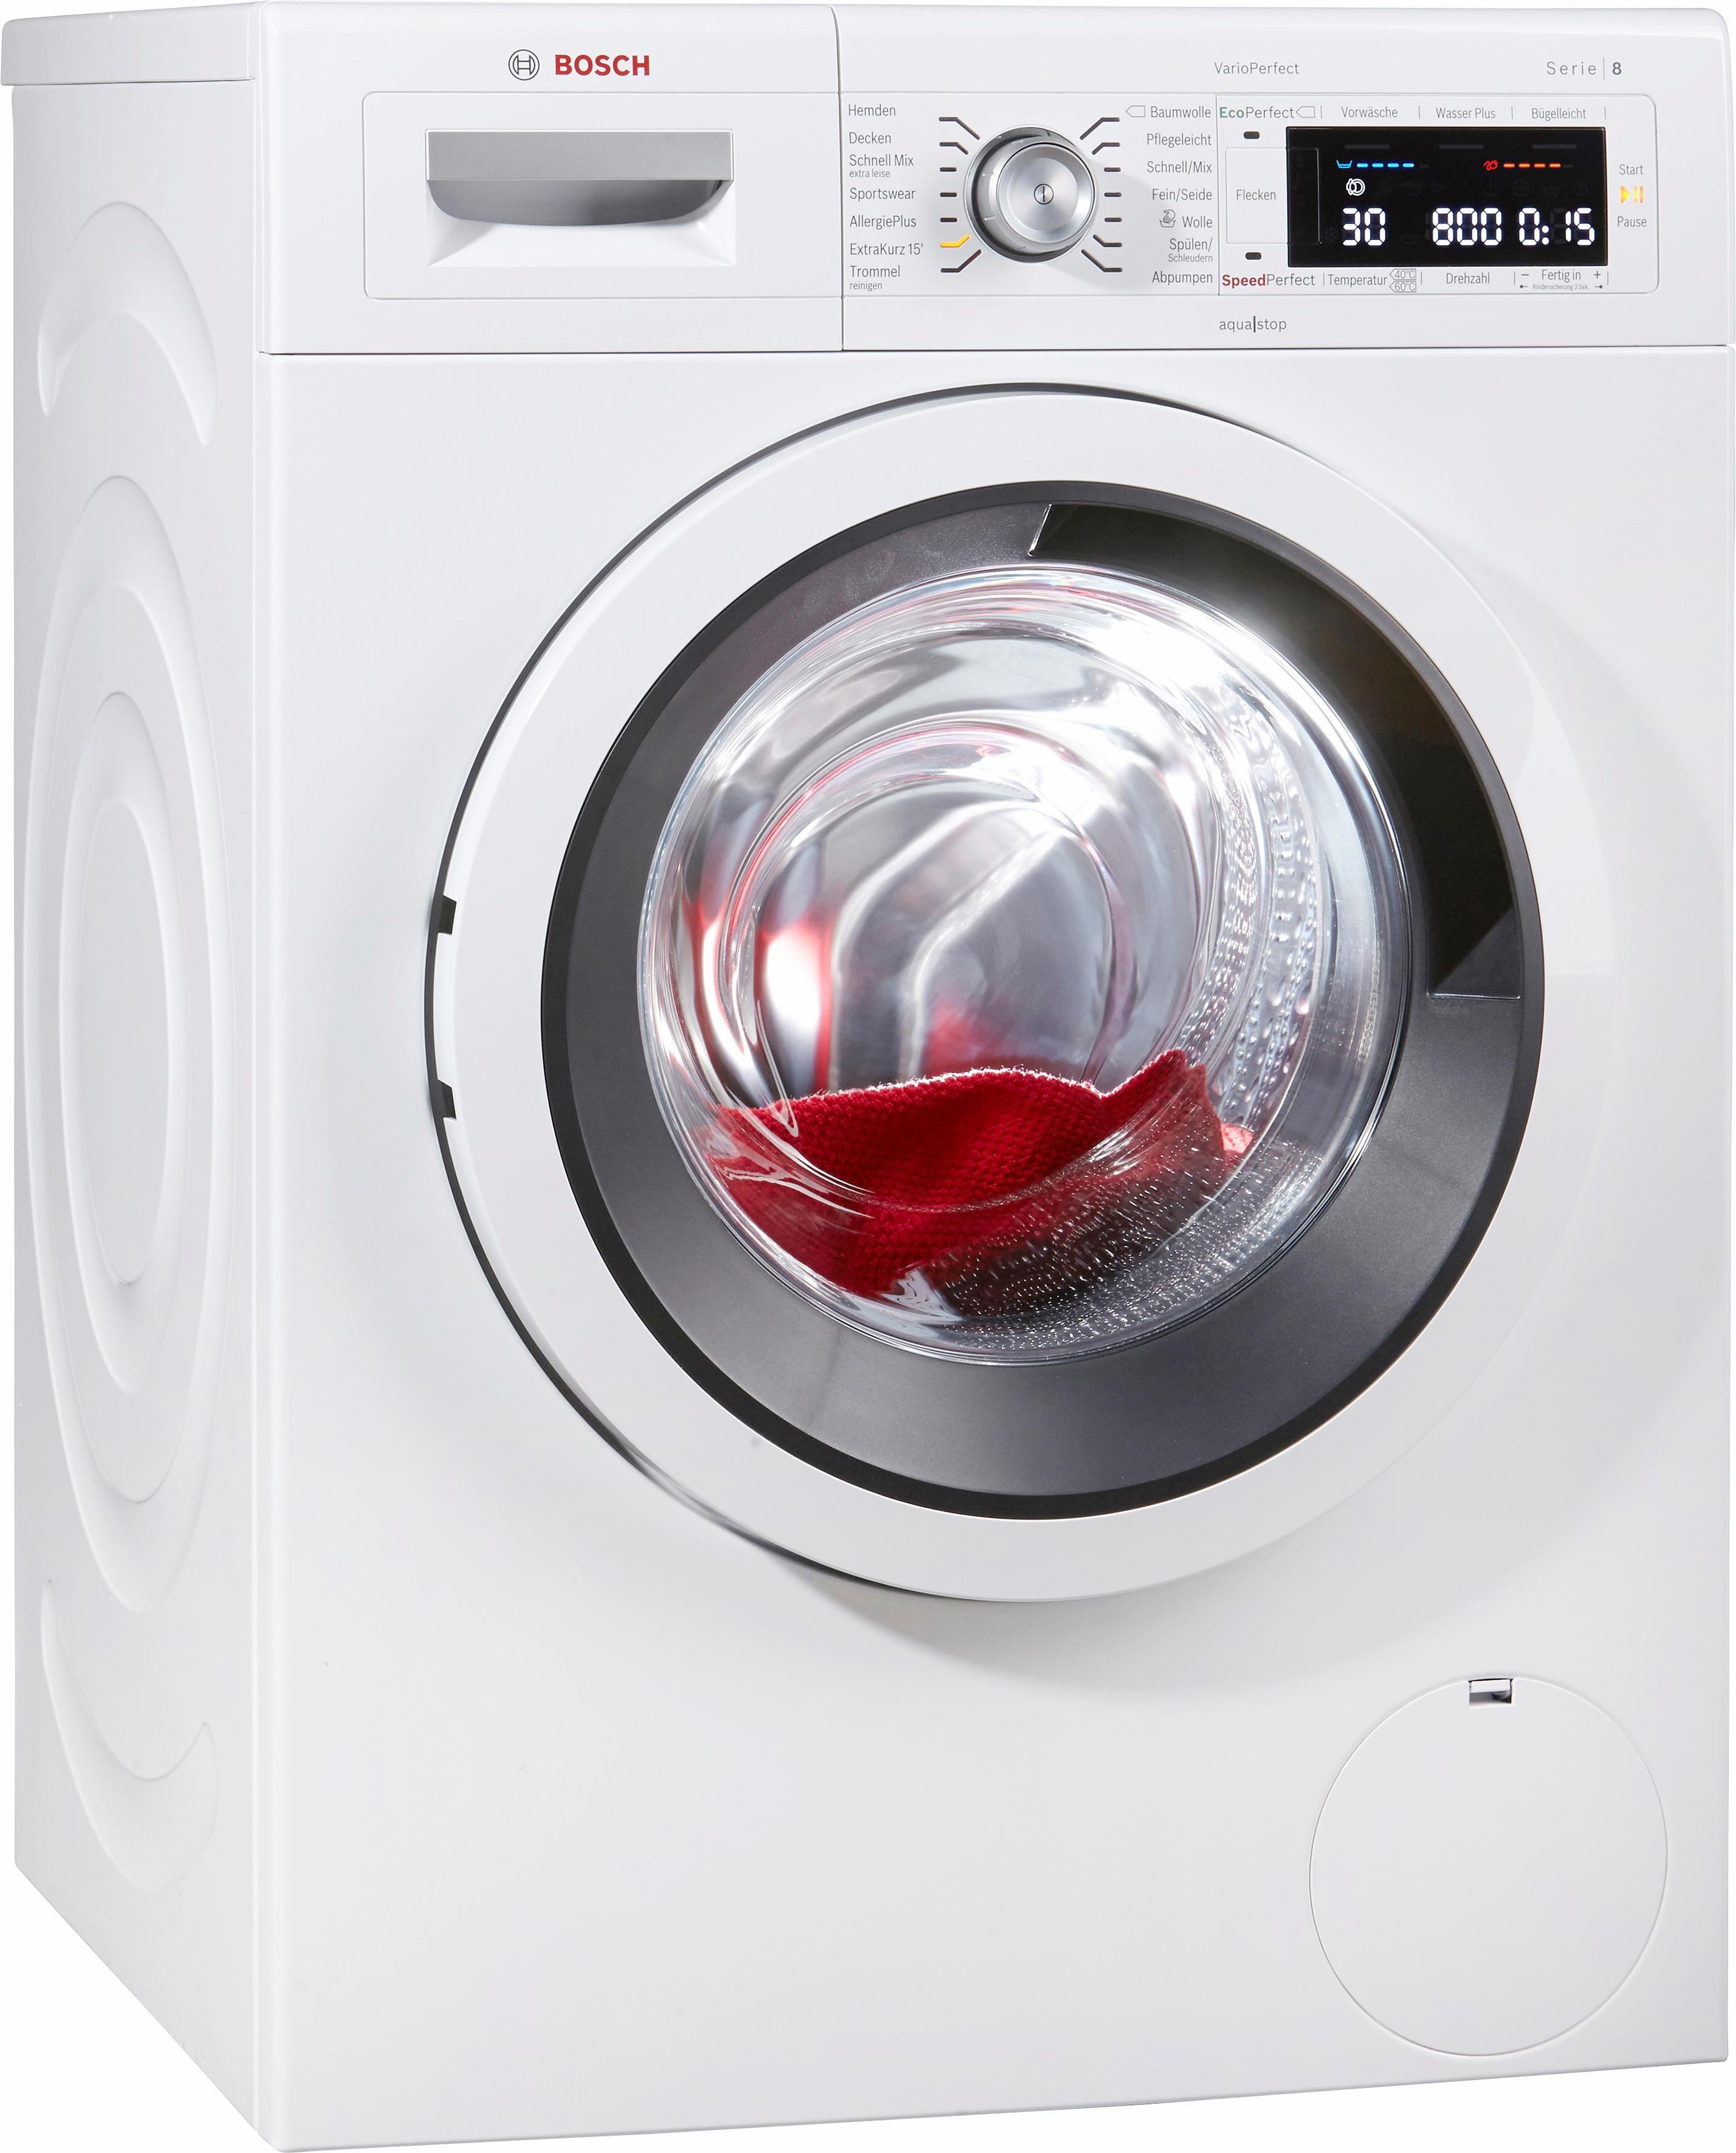 BOSCH Waschmaschine Serie 8 WAW285V1, A+++, 9 kg, 1400 U/Min